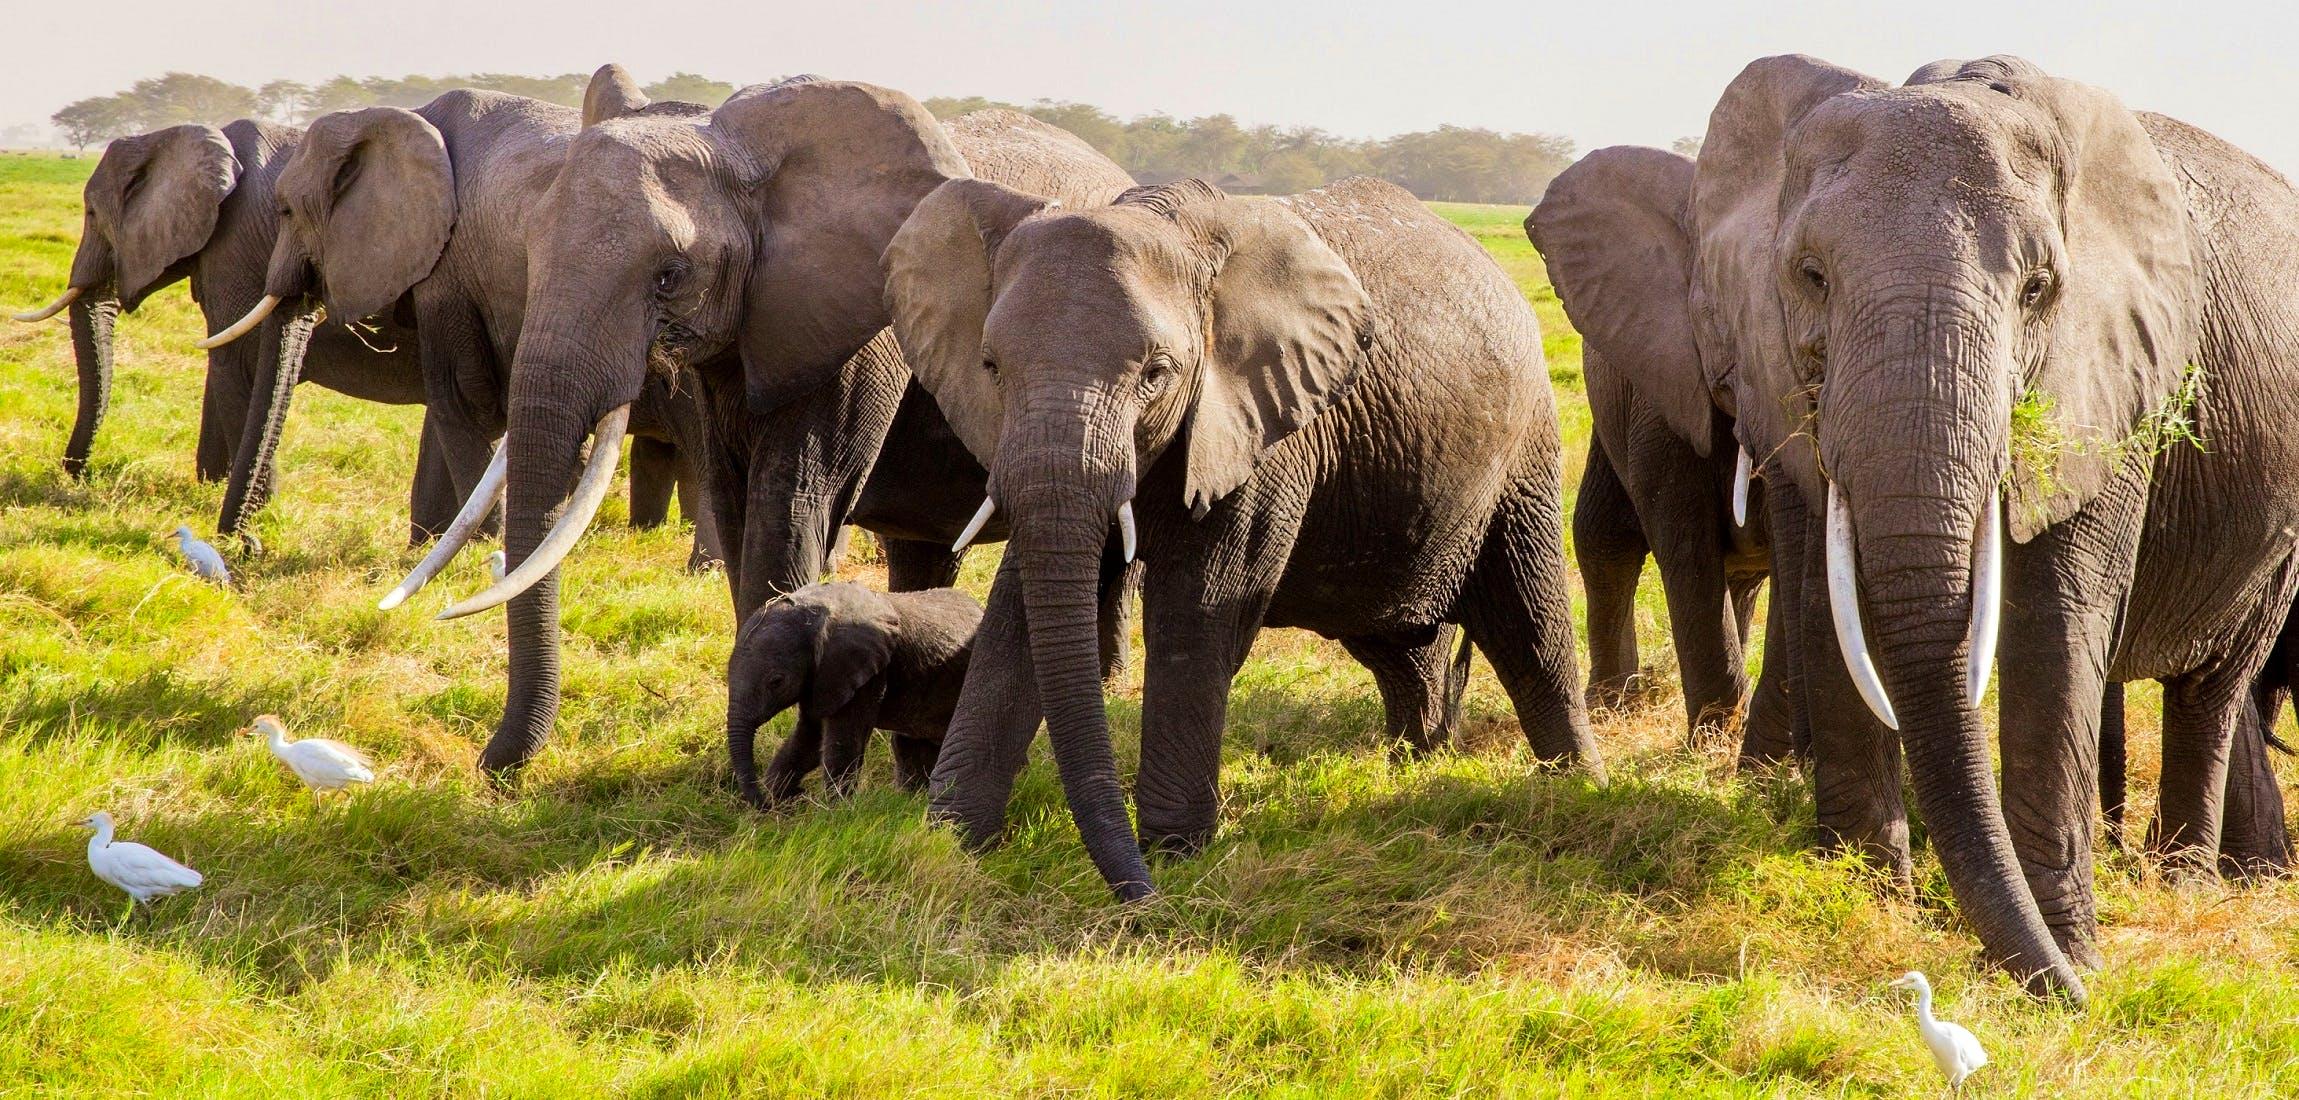 Kahumbu Fieldw Elephants Kenya Hrs Auto Compress Enhance Format Crop Faces Entropy Edges Fit Fm Young Icon Award